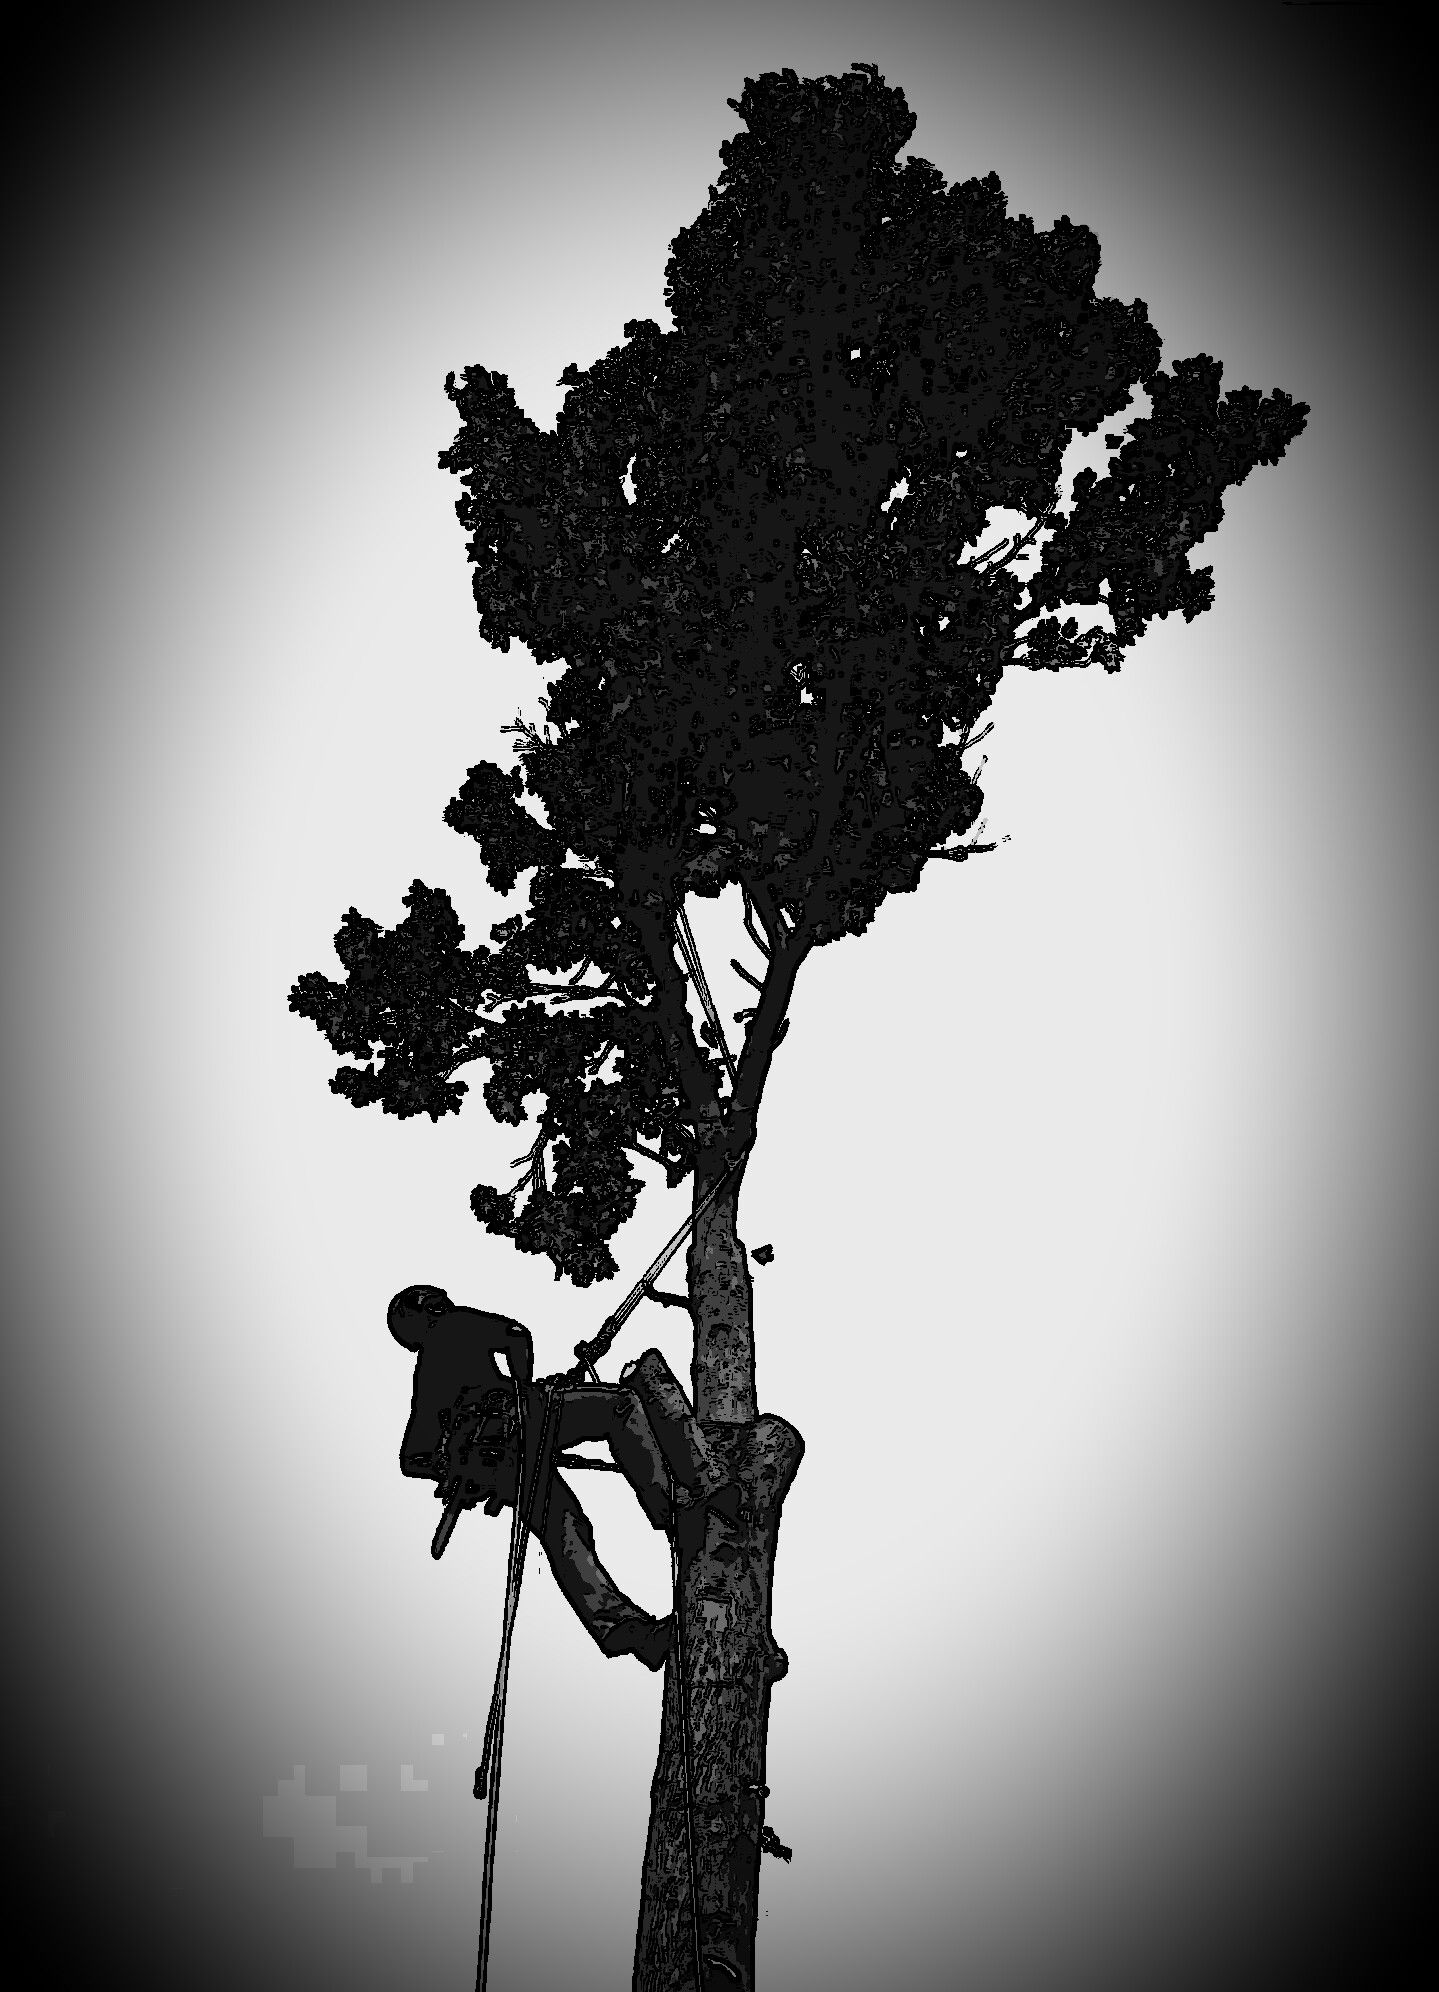 Climbing a sweetgum tree to cut it down in Manhattan